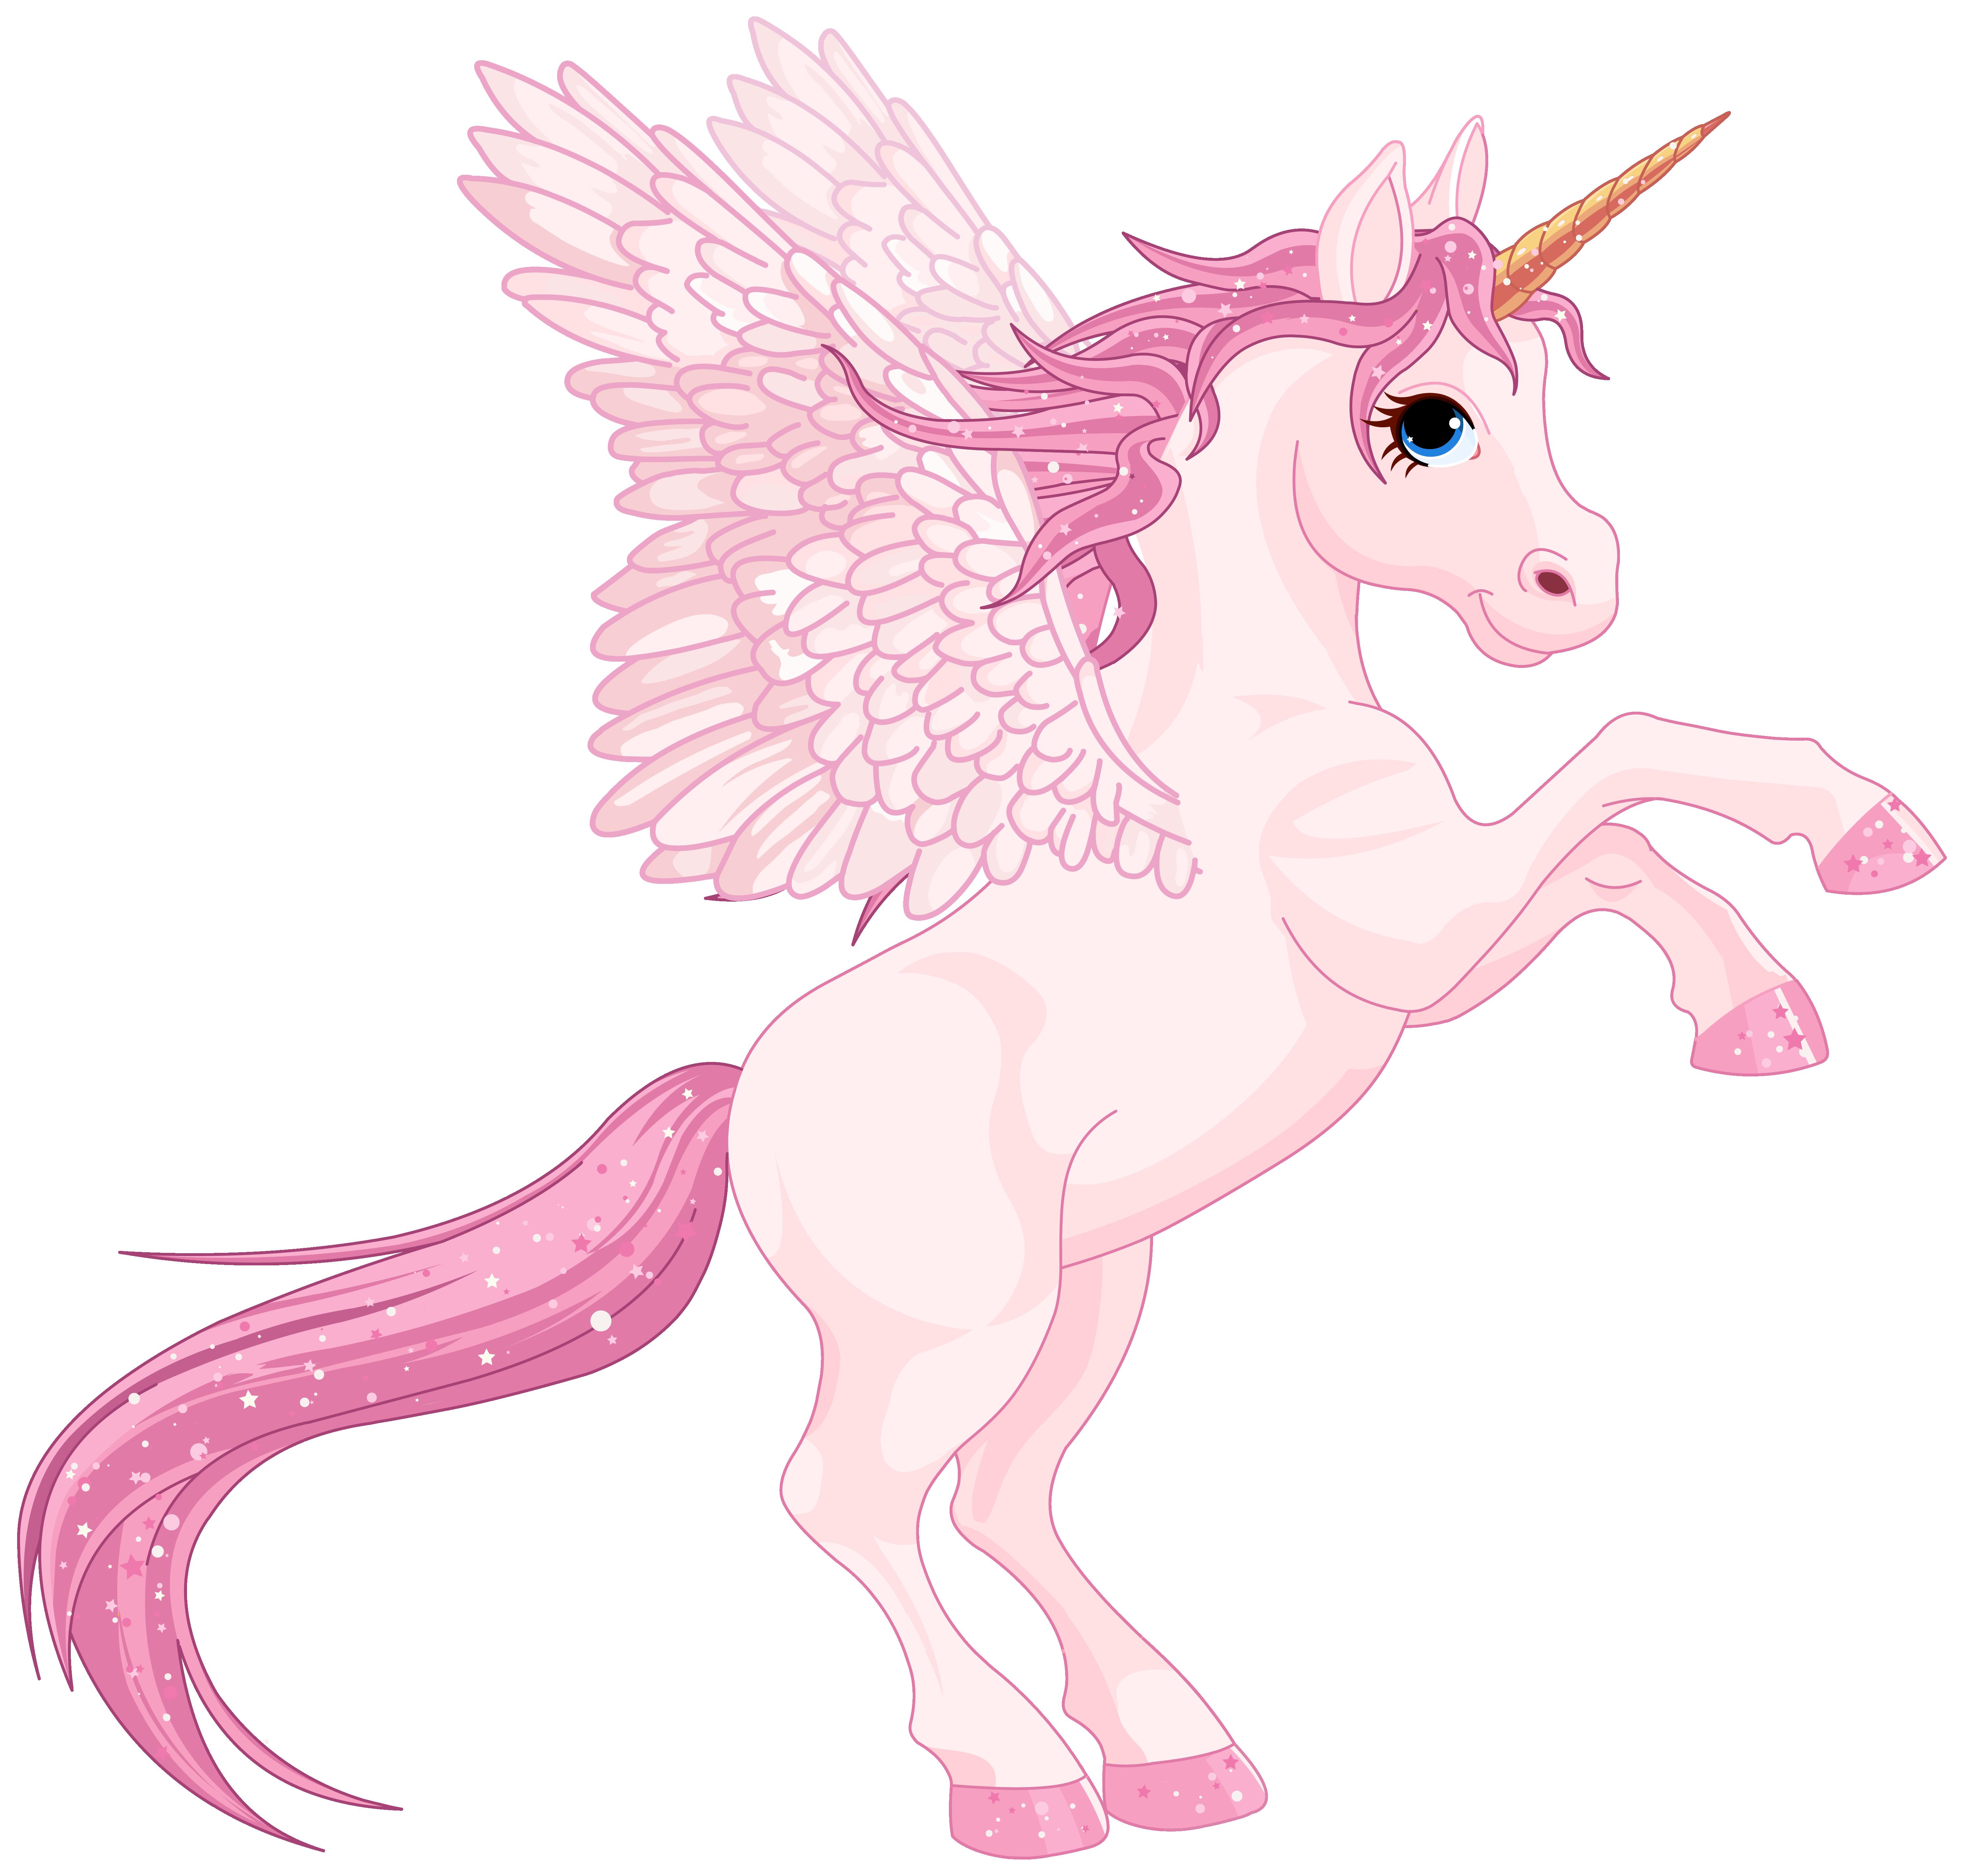 Horn clipart cartoon. Cute pink pegasus png